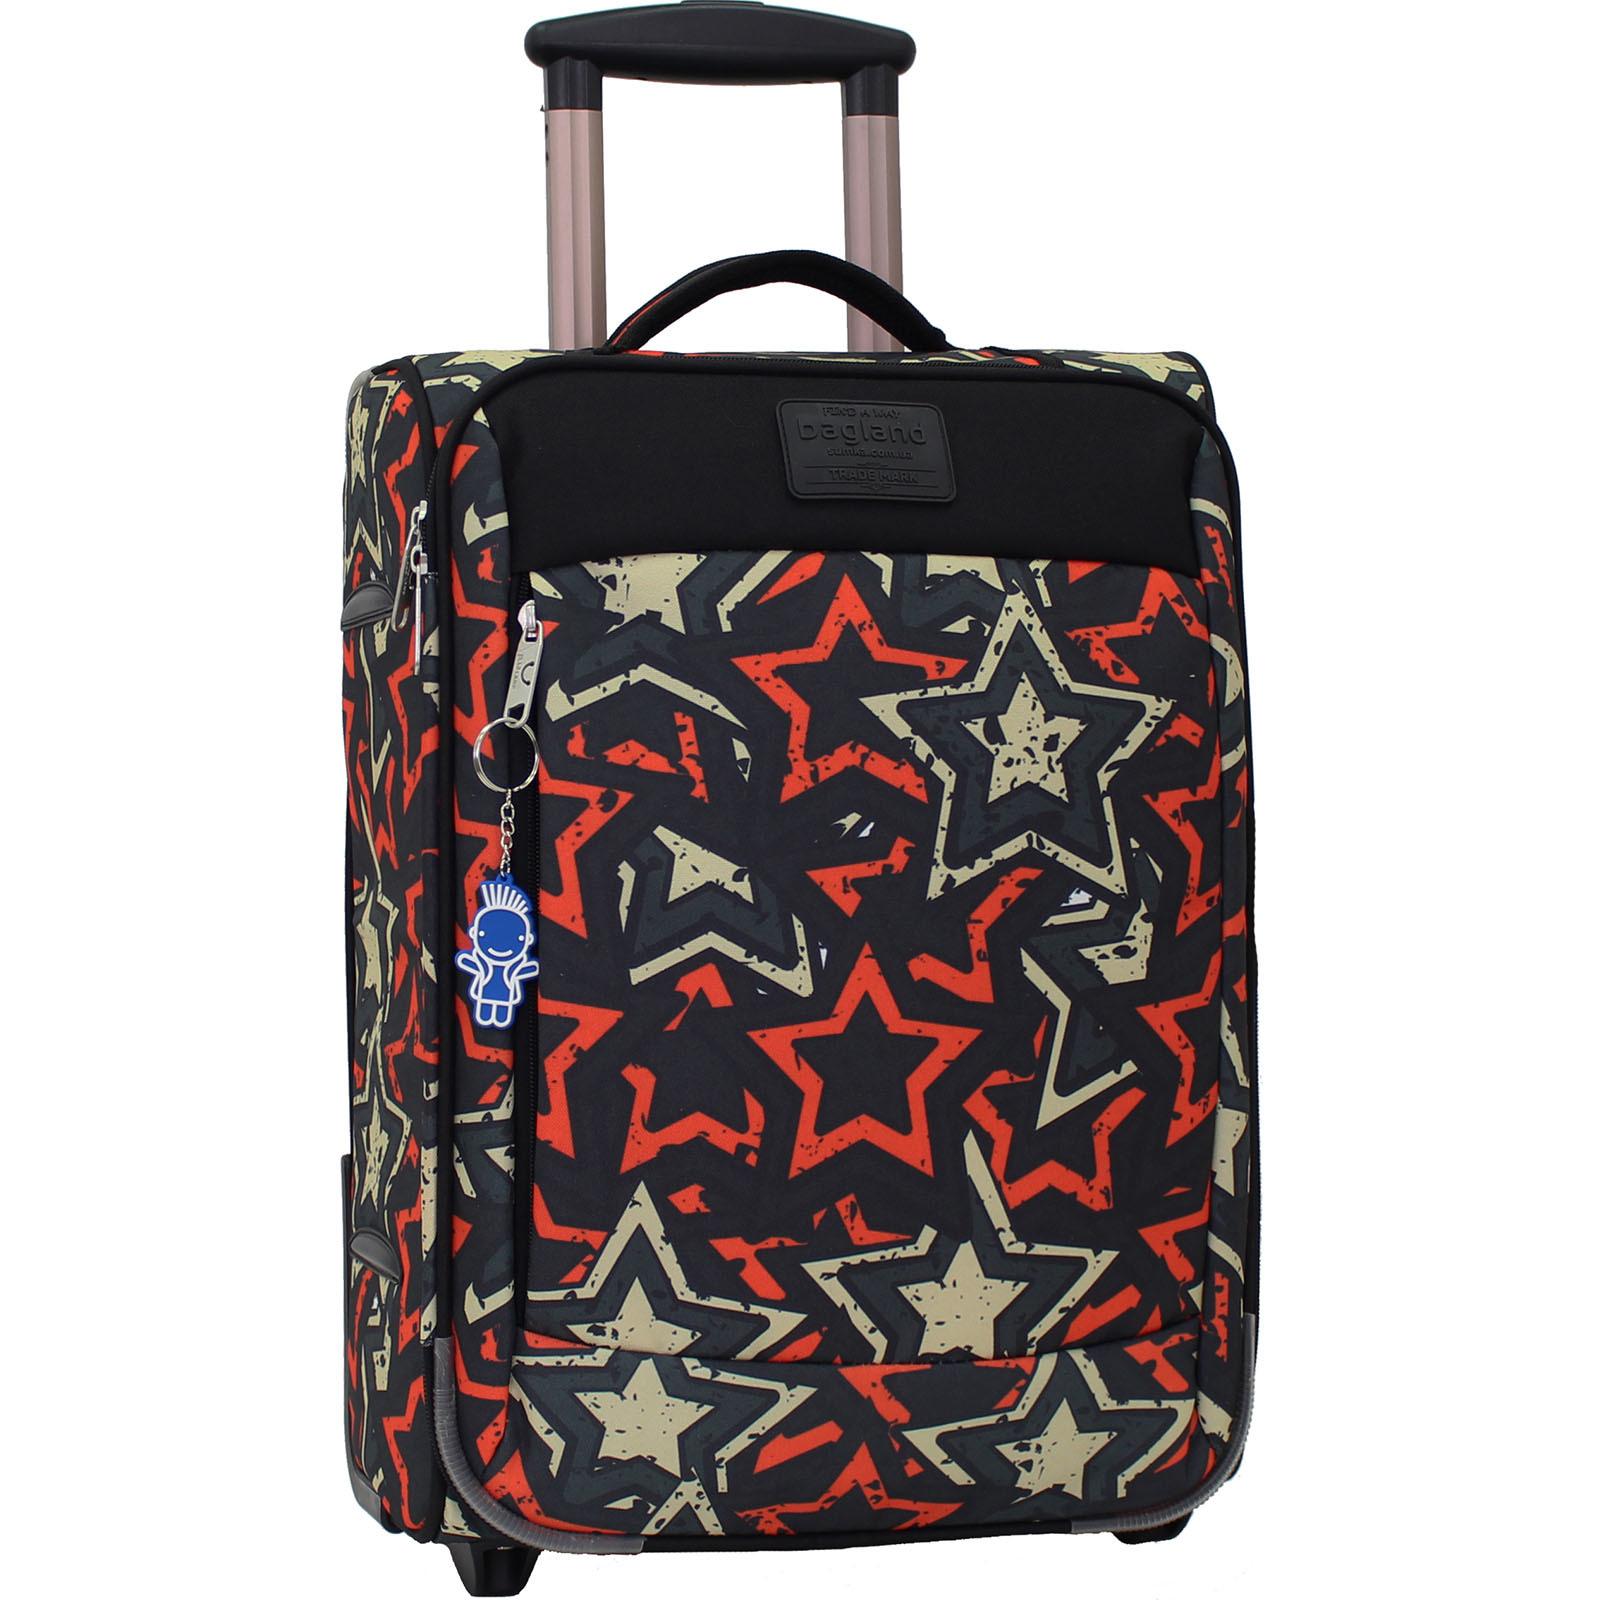 Дорожные чемоданы Чемодан Bagland Vichenzo 32 л. сублімація 185 (0037666194) IMG_1395.JPG